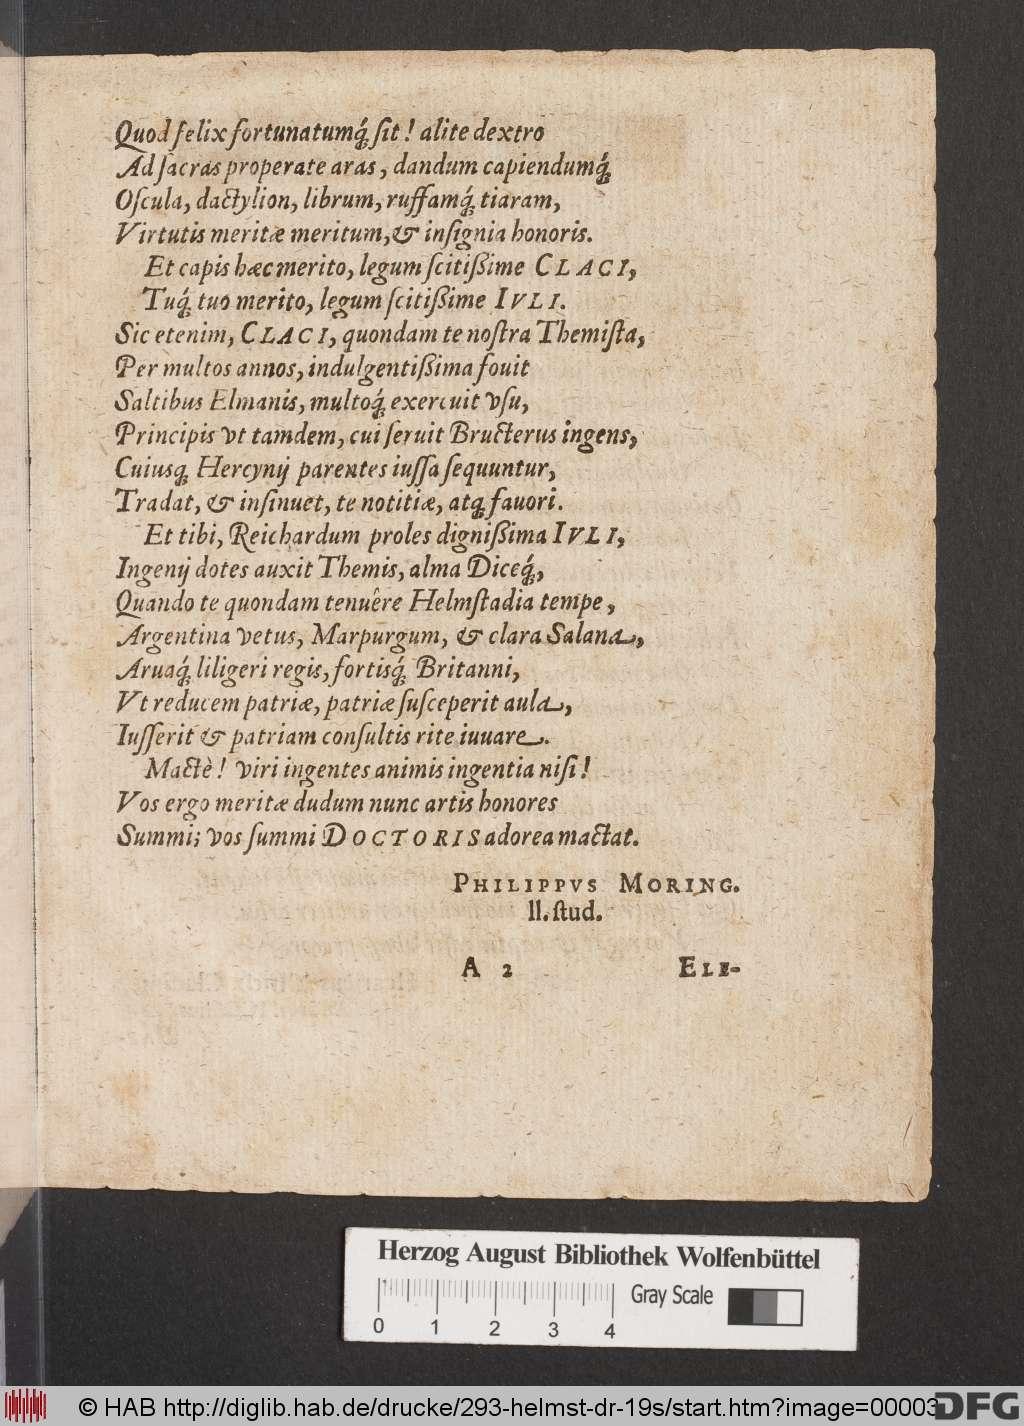 http://diglib.hab.de/drucke/293-helmst-dr-19s/00003.jpg